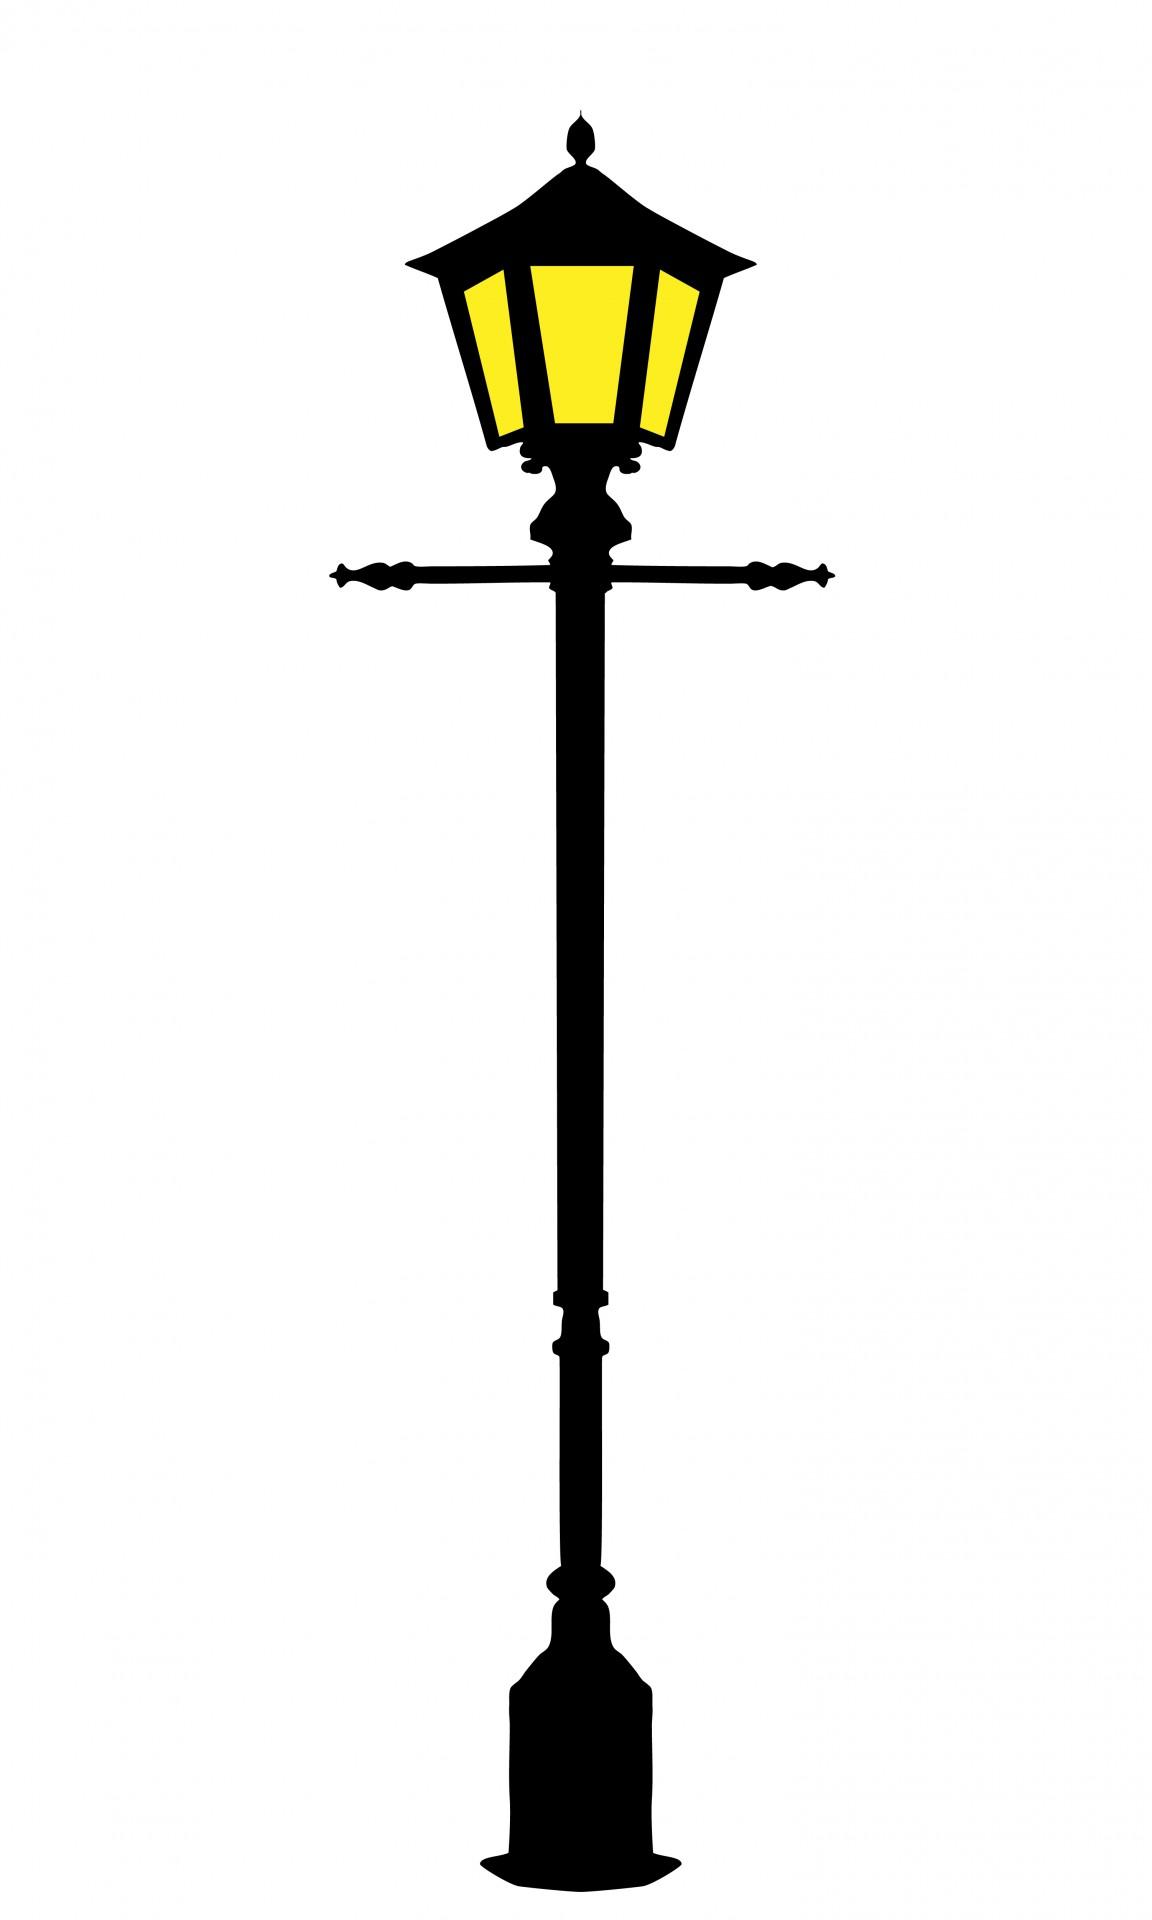 Street light sign clipart clip art royalty free Street Light Clipart & Look At Clip Art Images - ClipartLook clip art royalty free